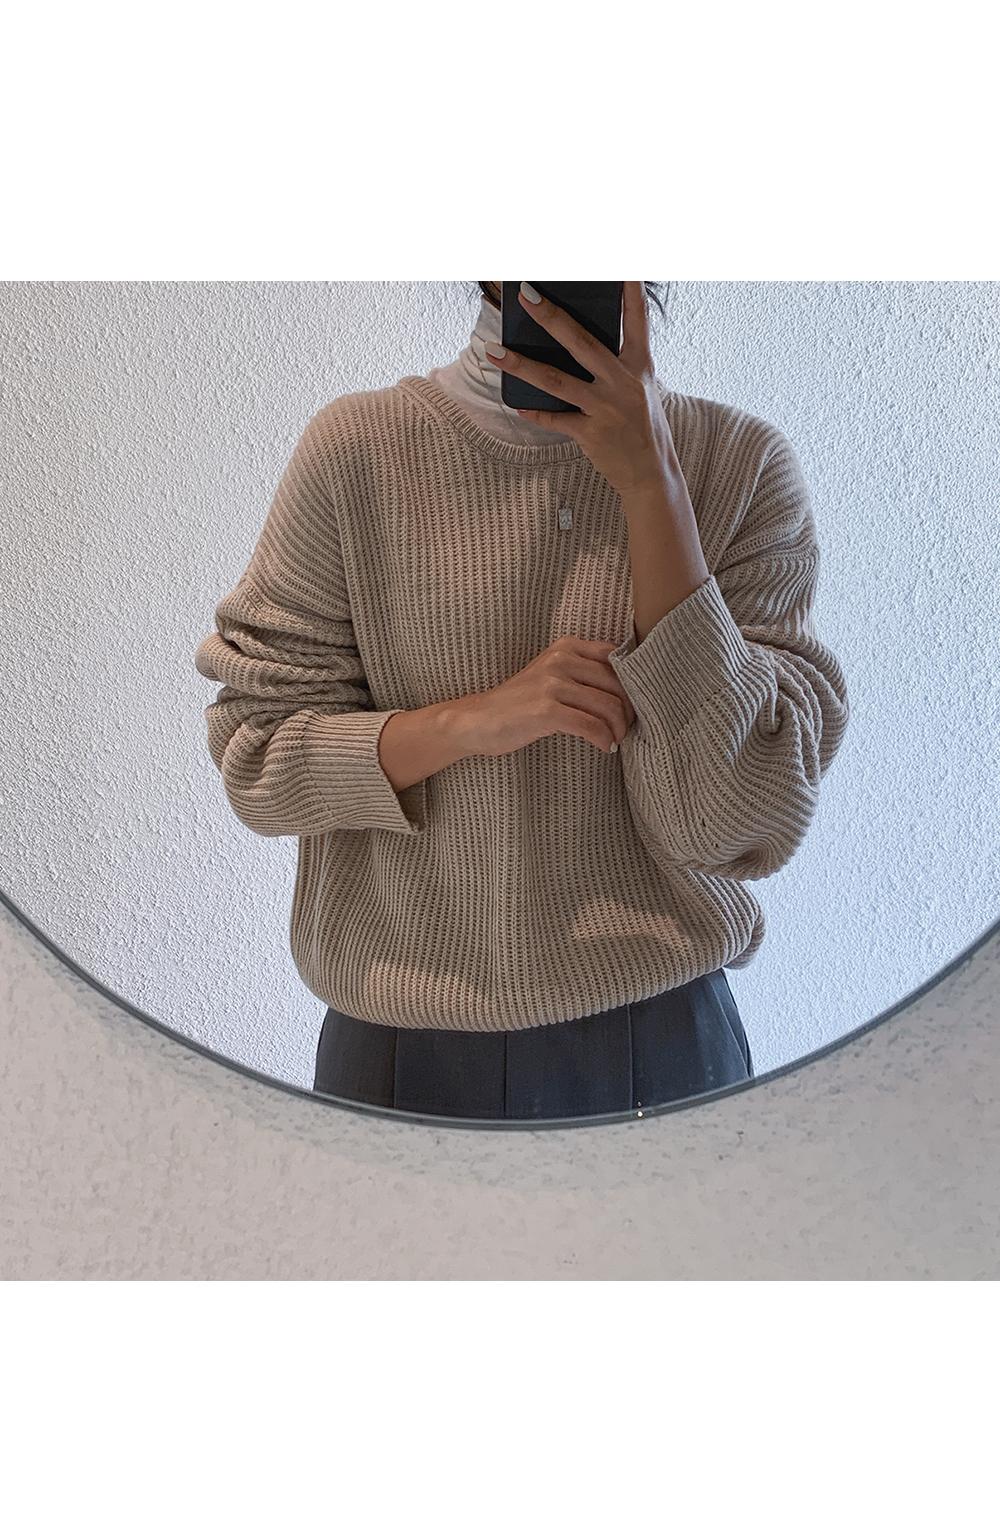 Simple and Basic Round Knit-holiholic.com